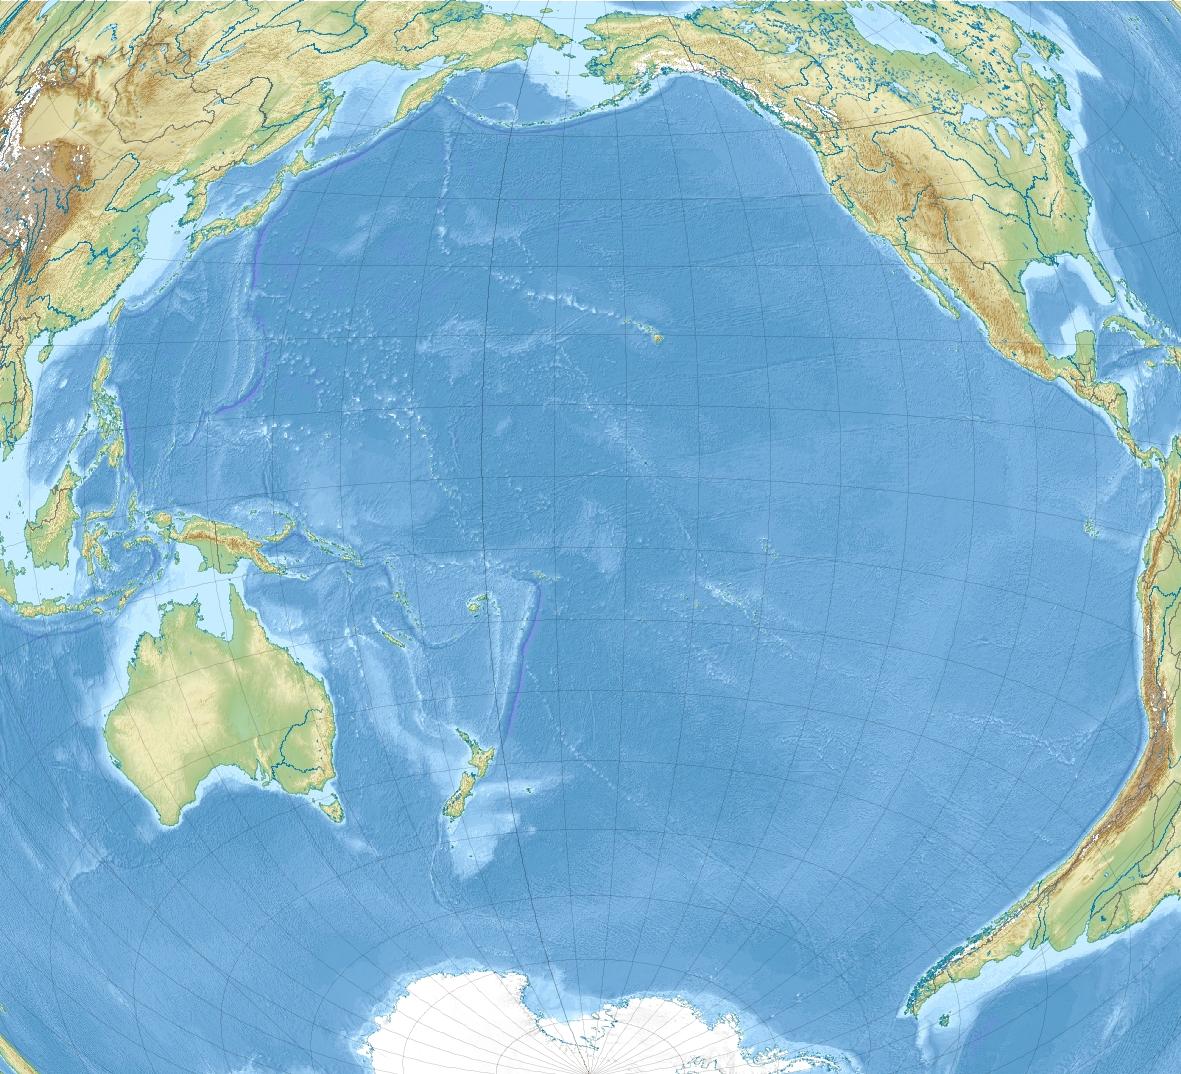 Datei:Pacific Ocean laea relief location map.jpg - Wikipedia